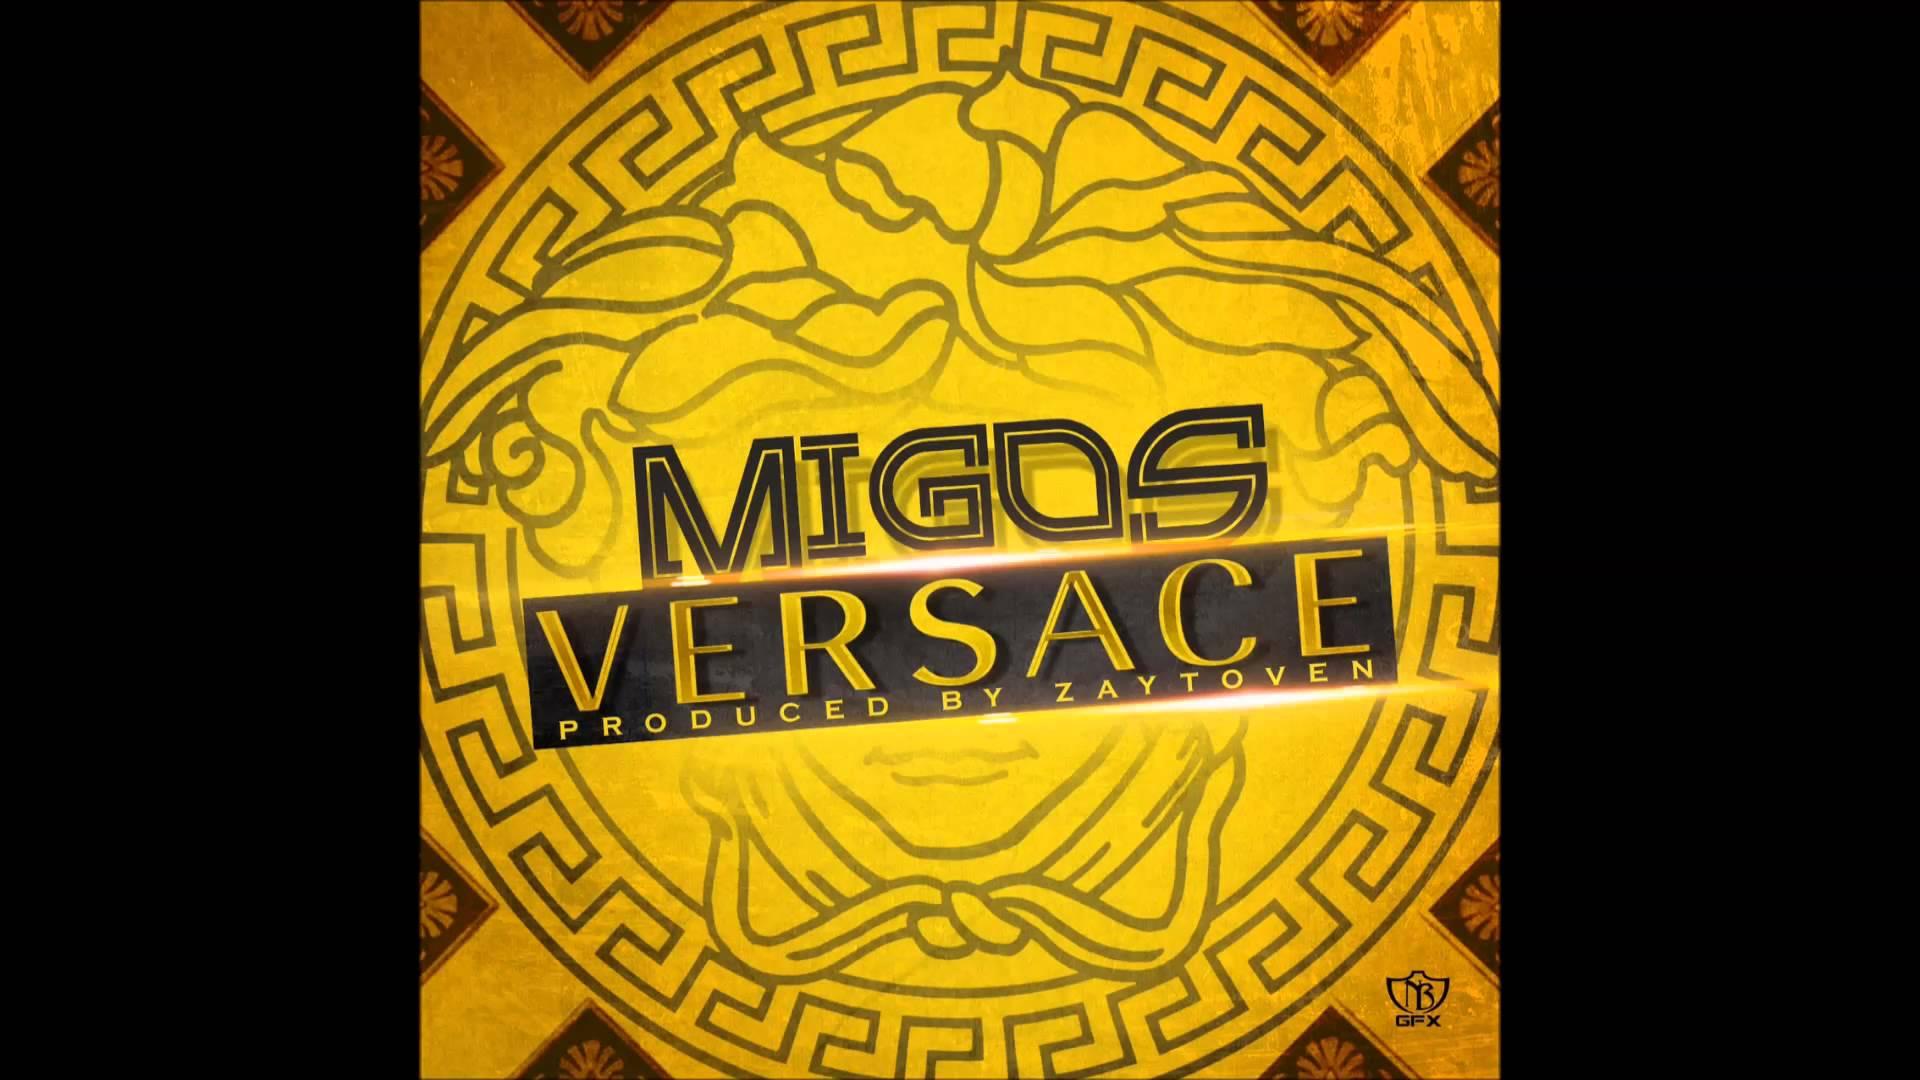 Migos x Drake - Versace [Instrumental] - YouTube